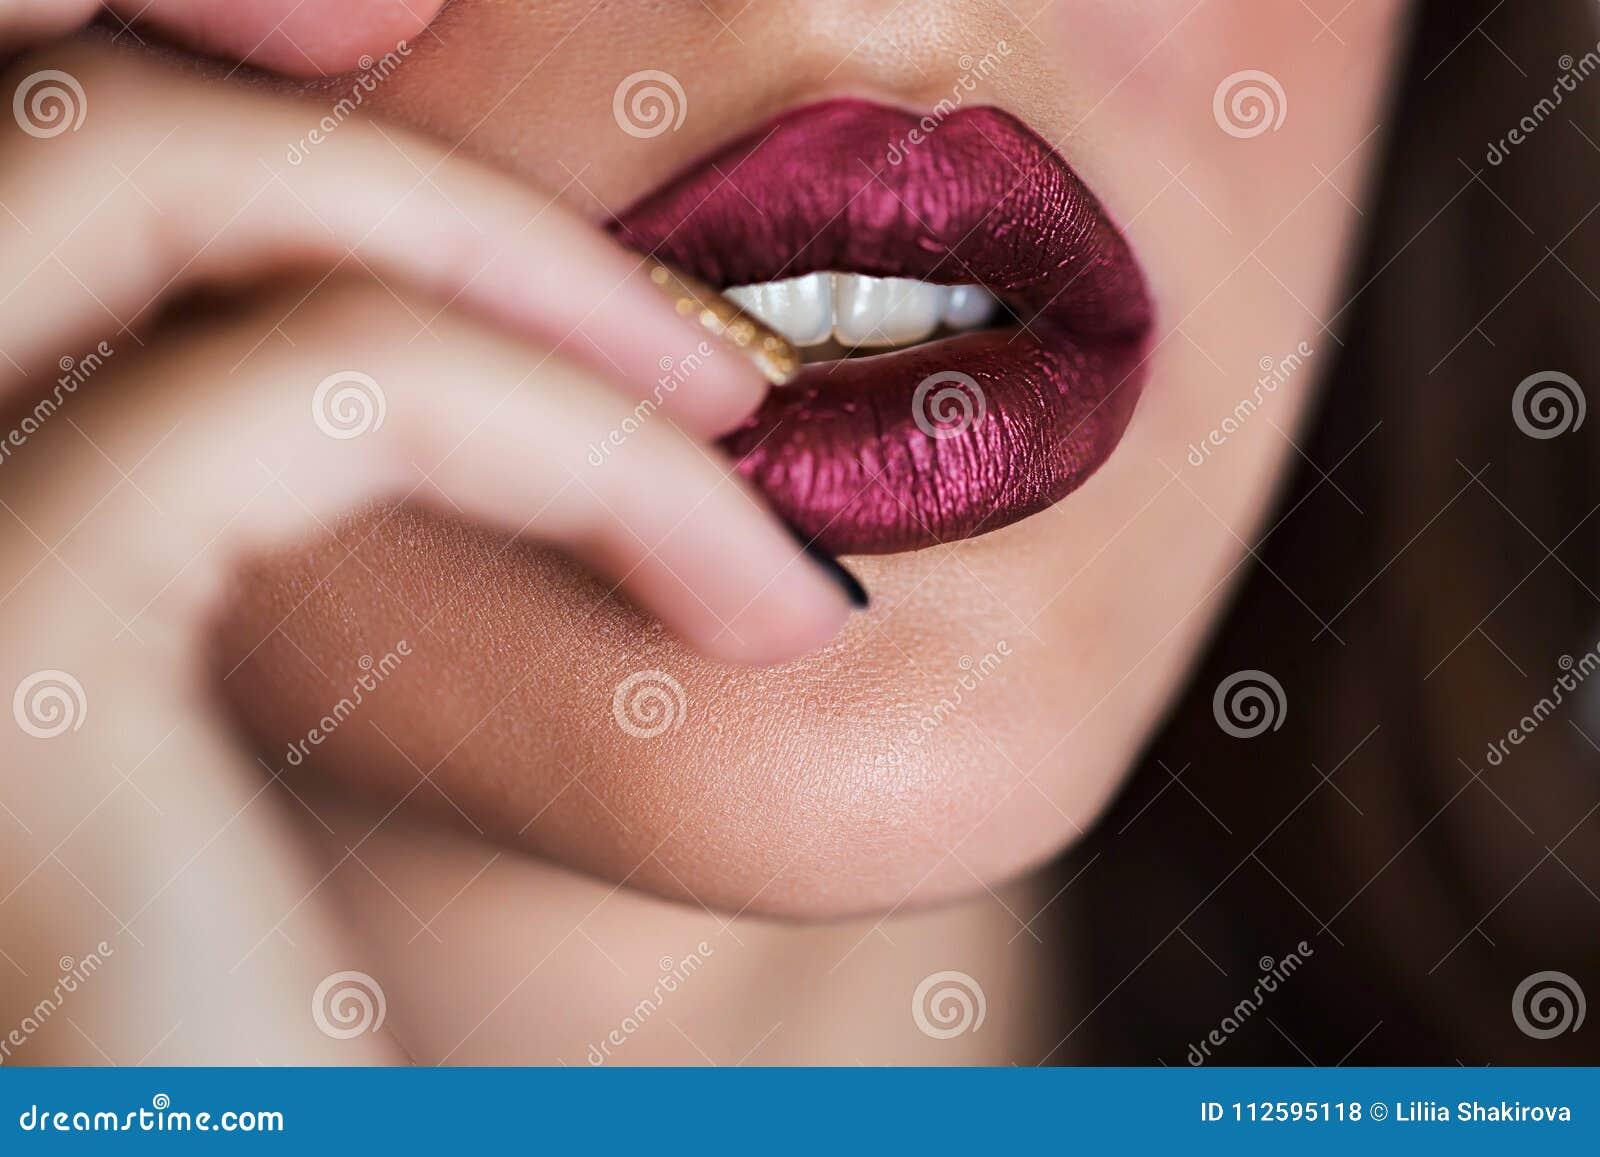 Close up of beautiful woman lips with lipstick. Open mouth. Cosmetology, fashion makeup concept. Beauty studio shot.